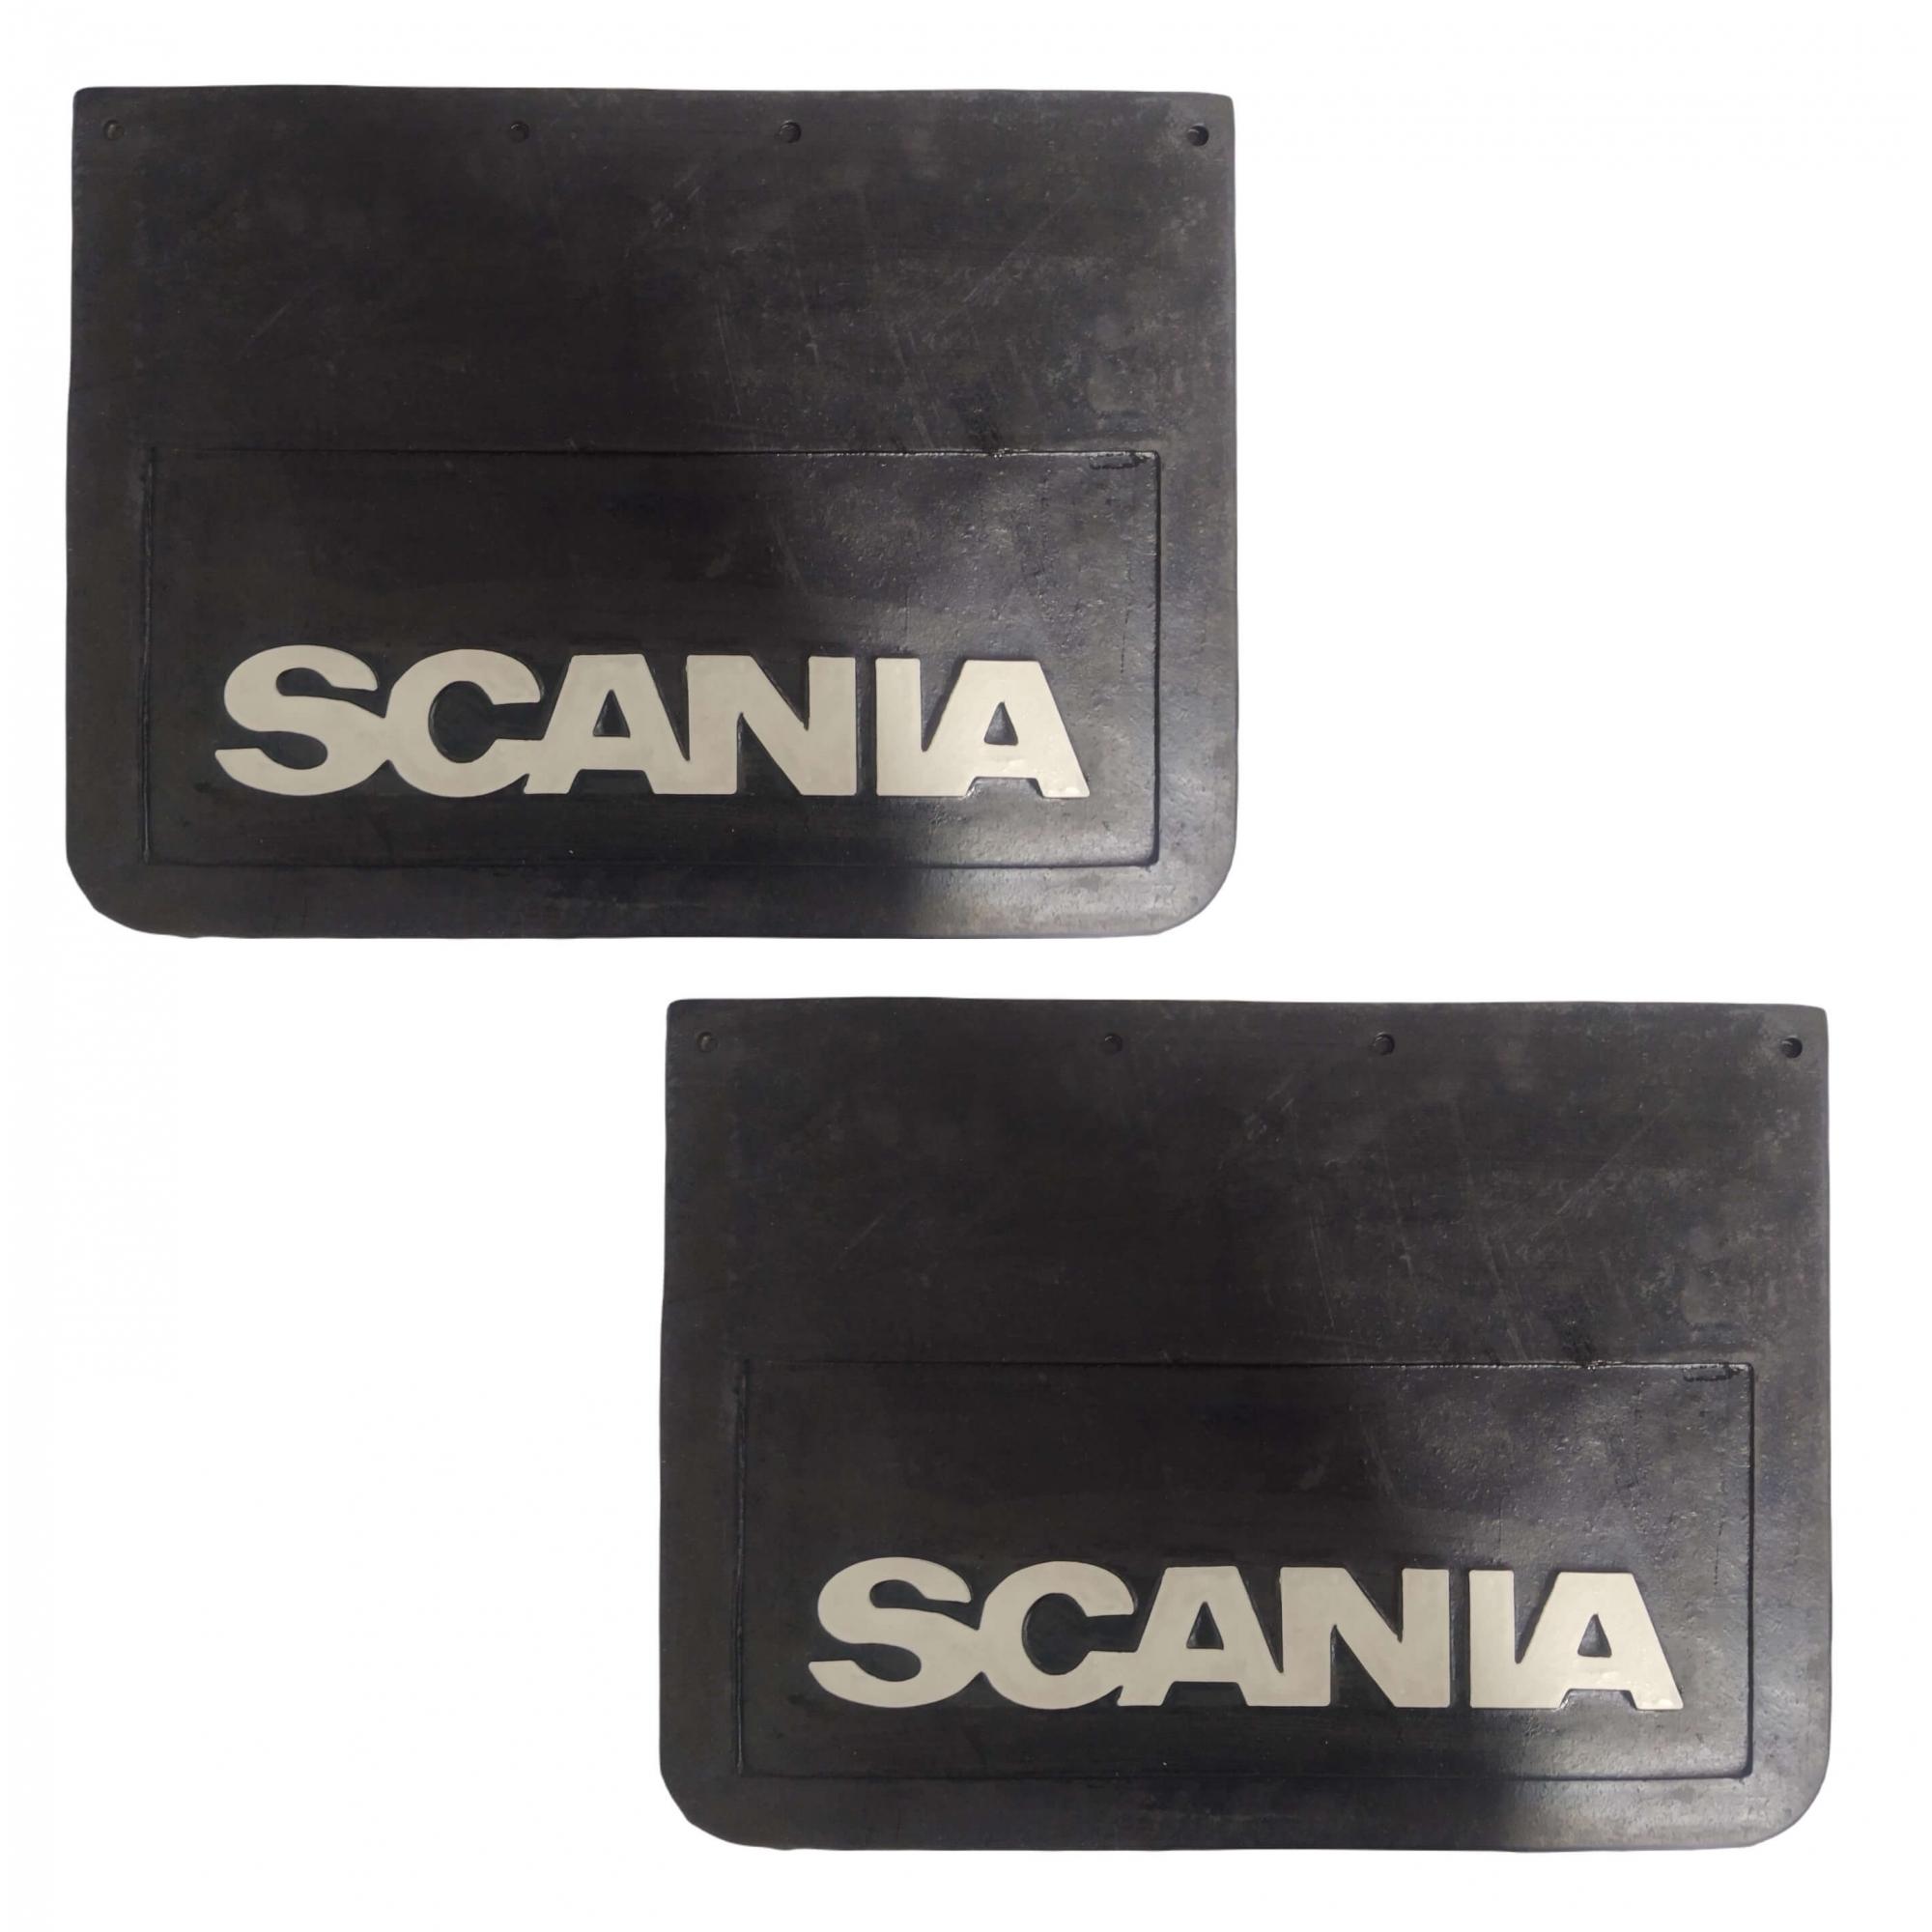 2 Parabarro Dianteiro Scania 112 113 Lameiro 50 X 36 Cm